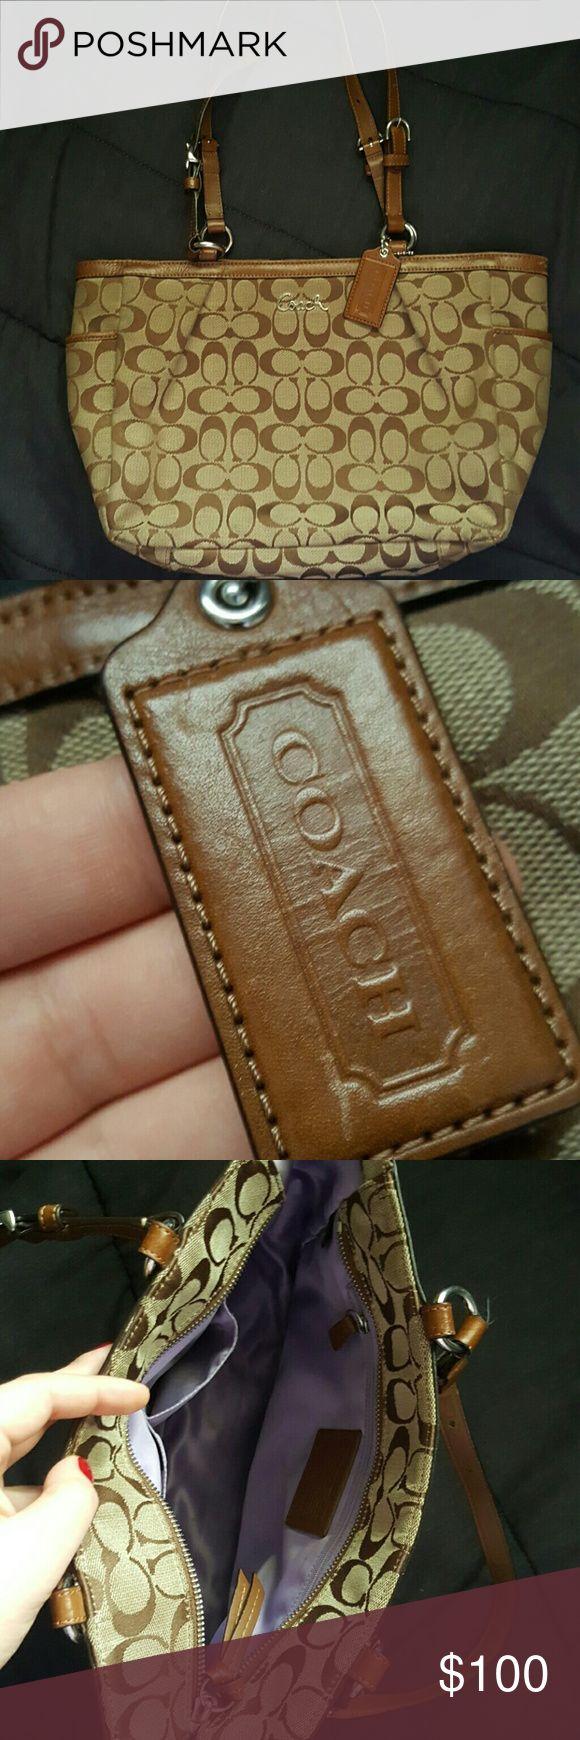 Coach purse Tan / khaki colored coach purse with leather trim and silver hardware, lavender silk interior, super clean Coach Bags Shoulder Bags